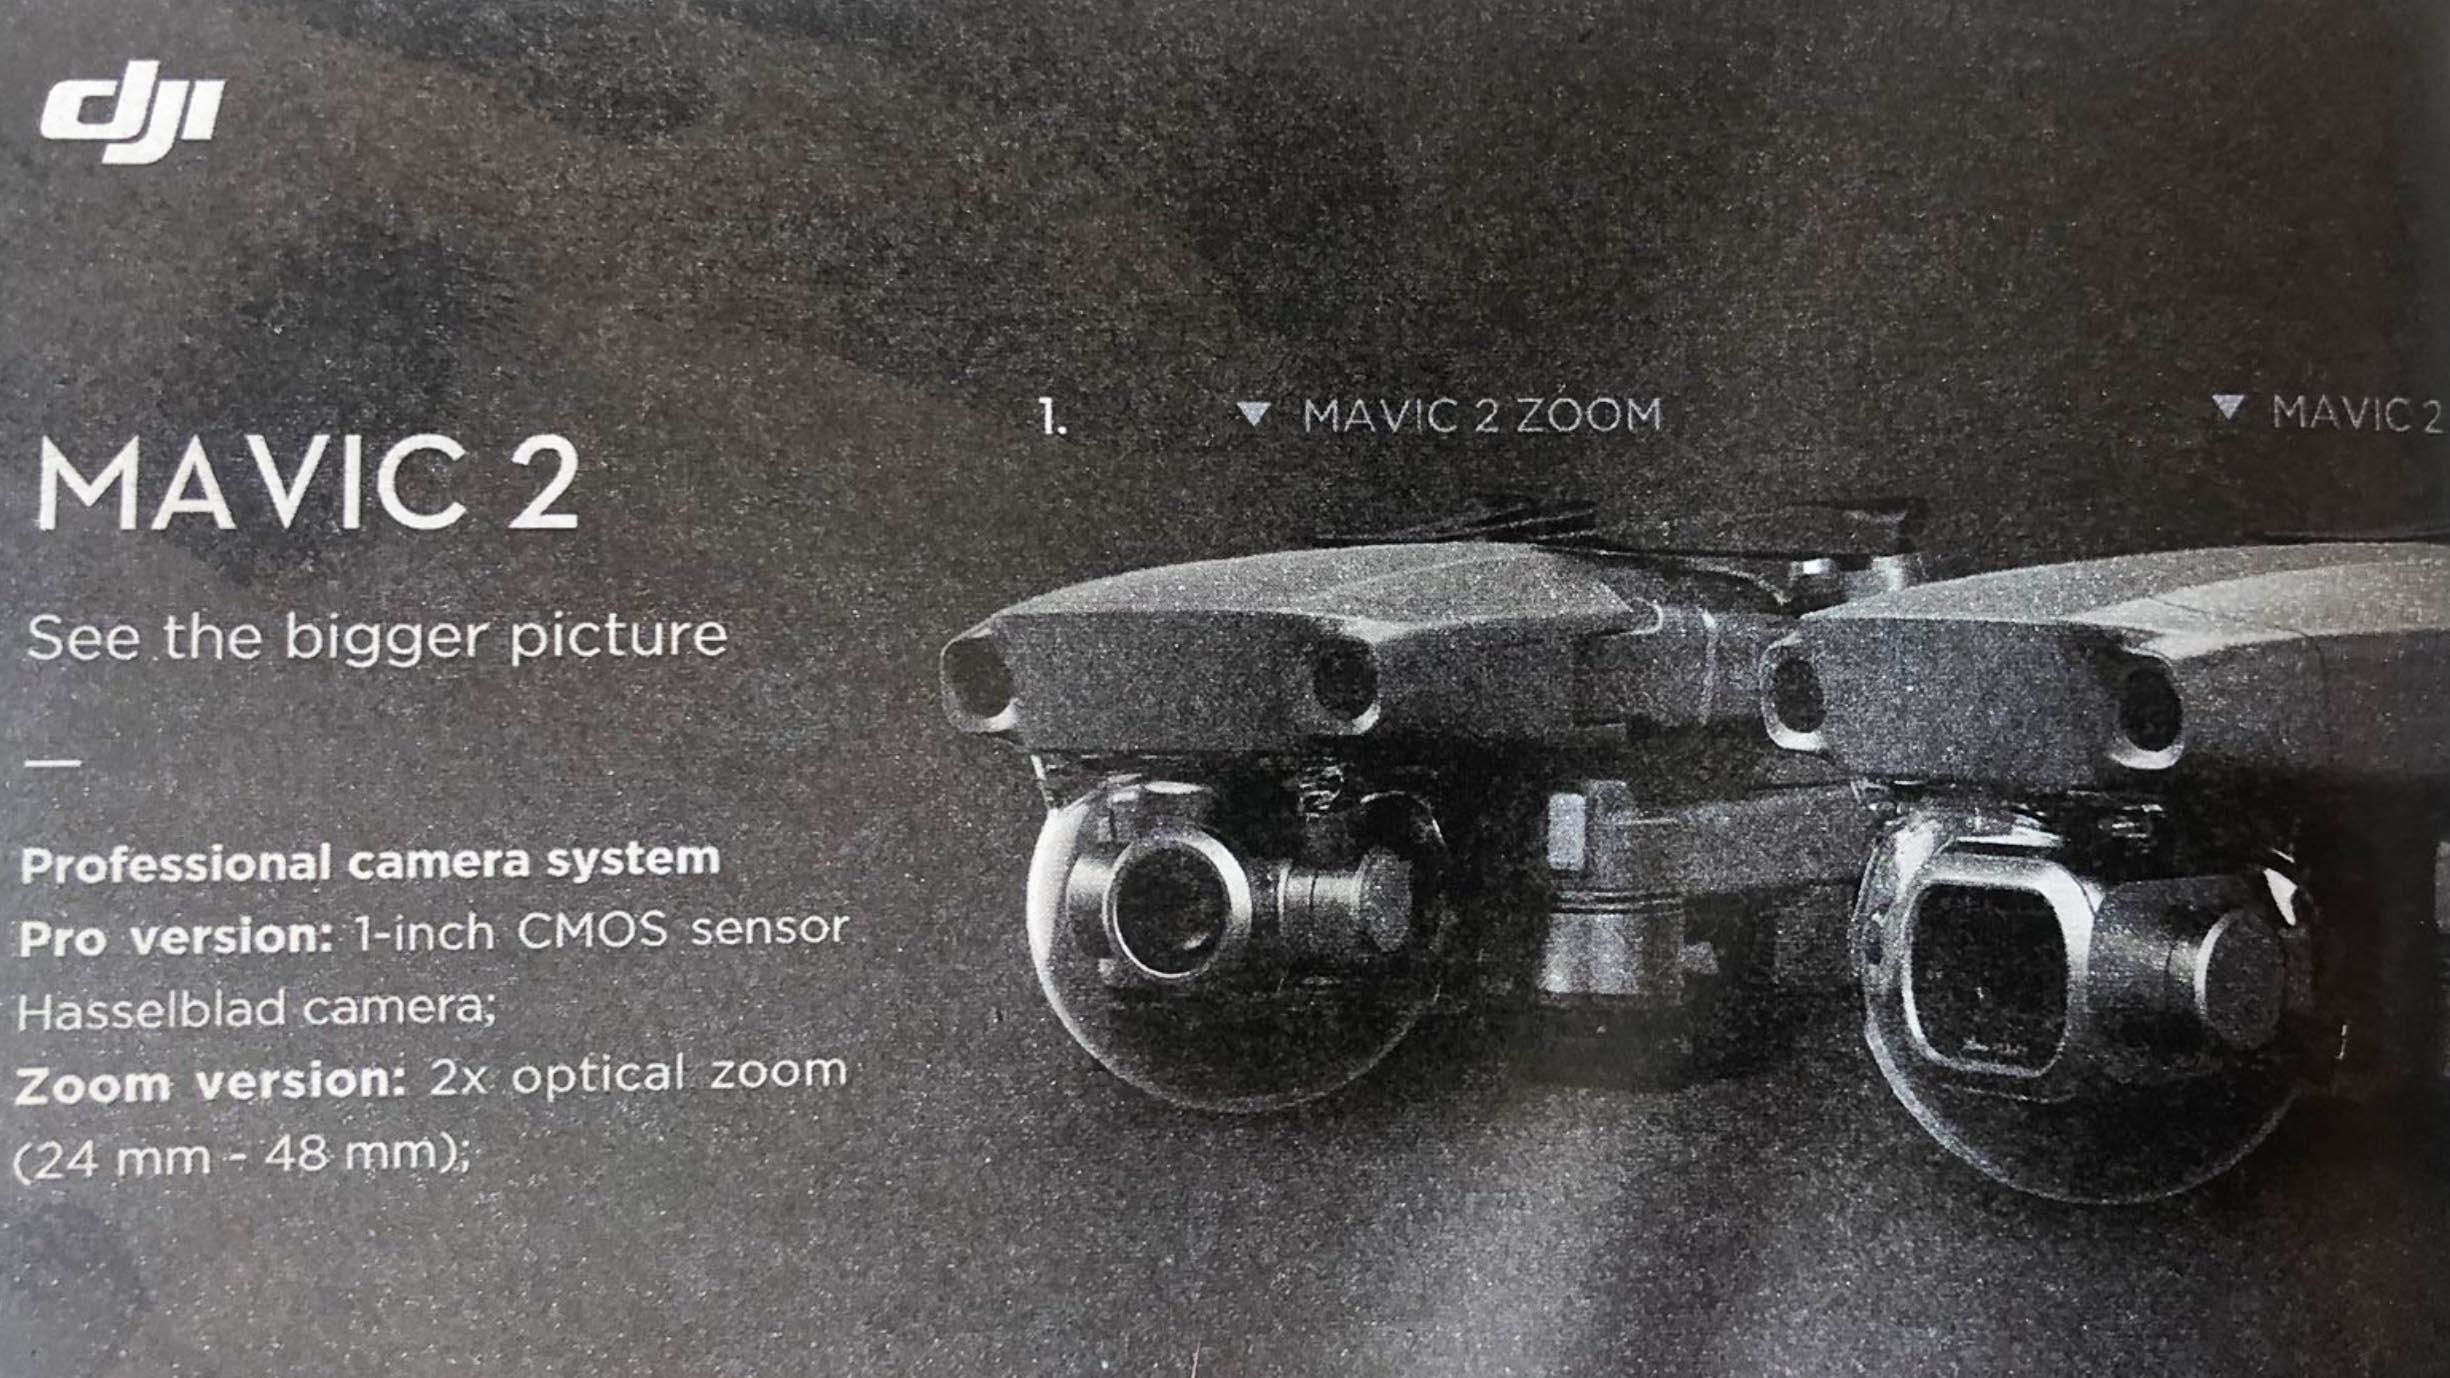 DJI Mavicの新製品情報 - 2モデルが存在する?